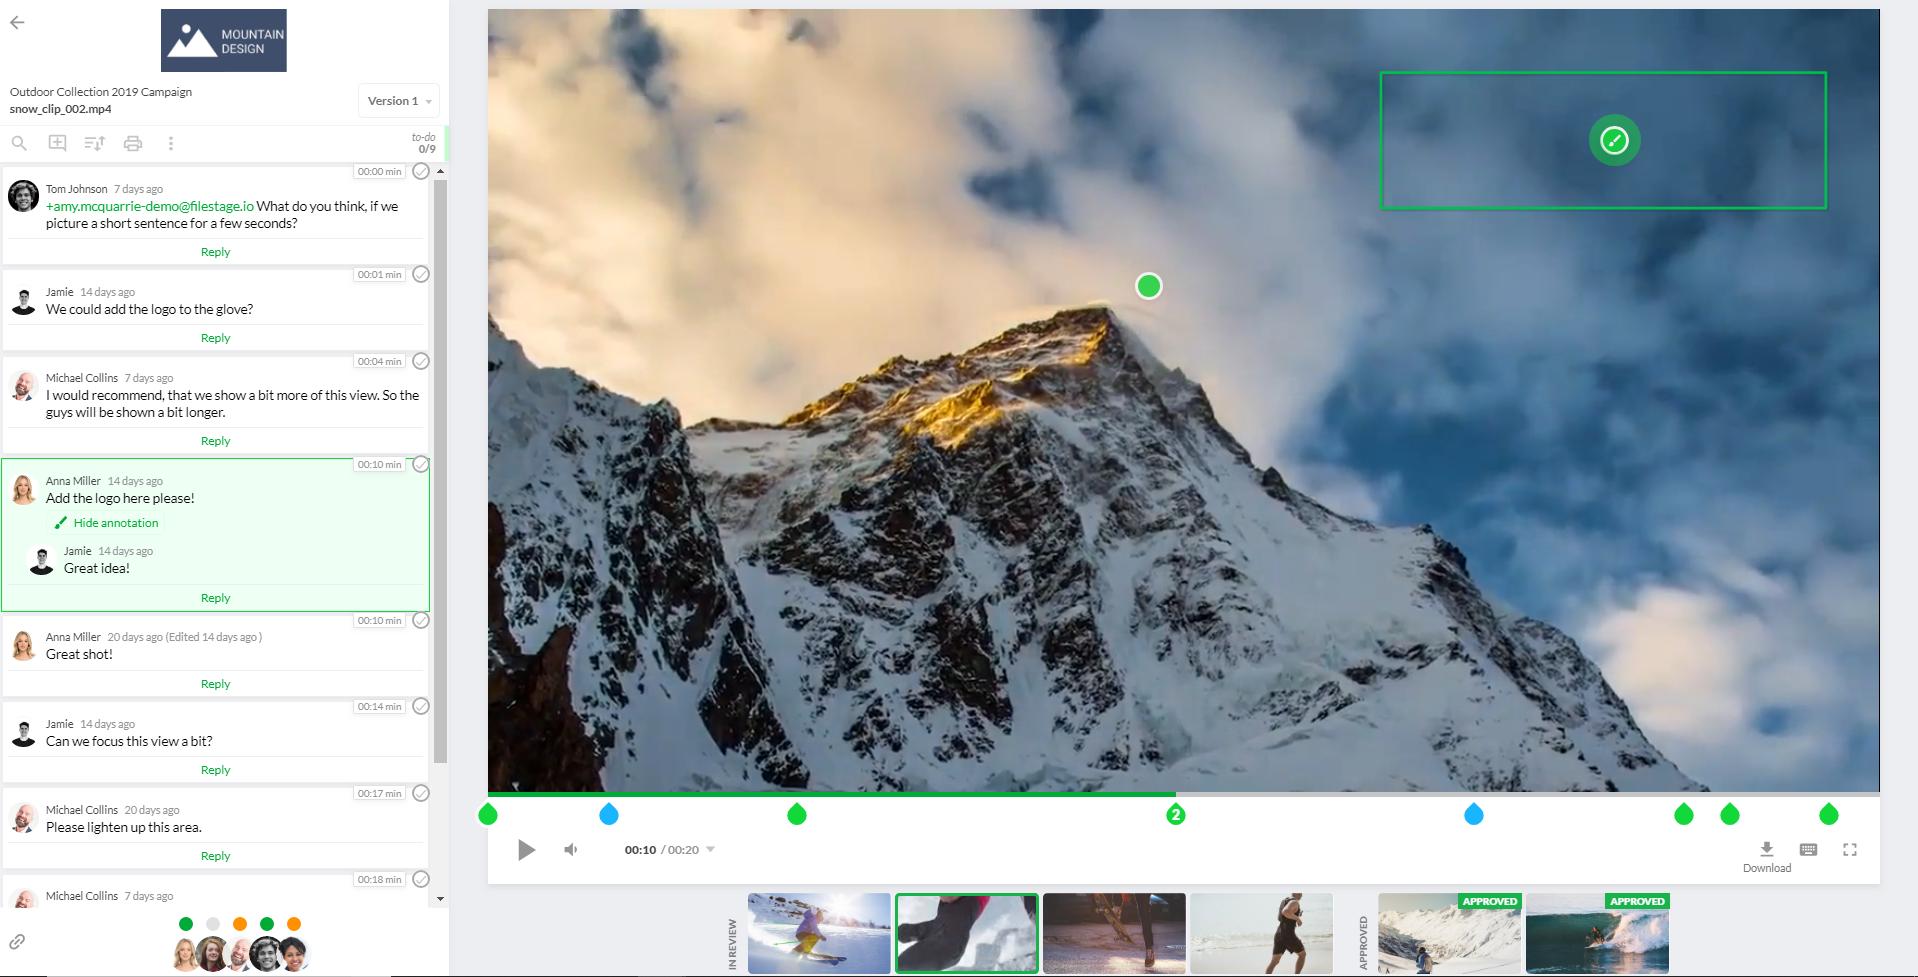 Filestage Demo - Filestage Video View